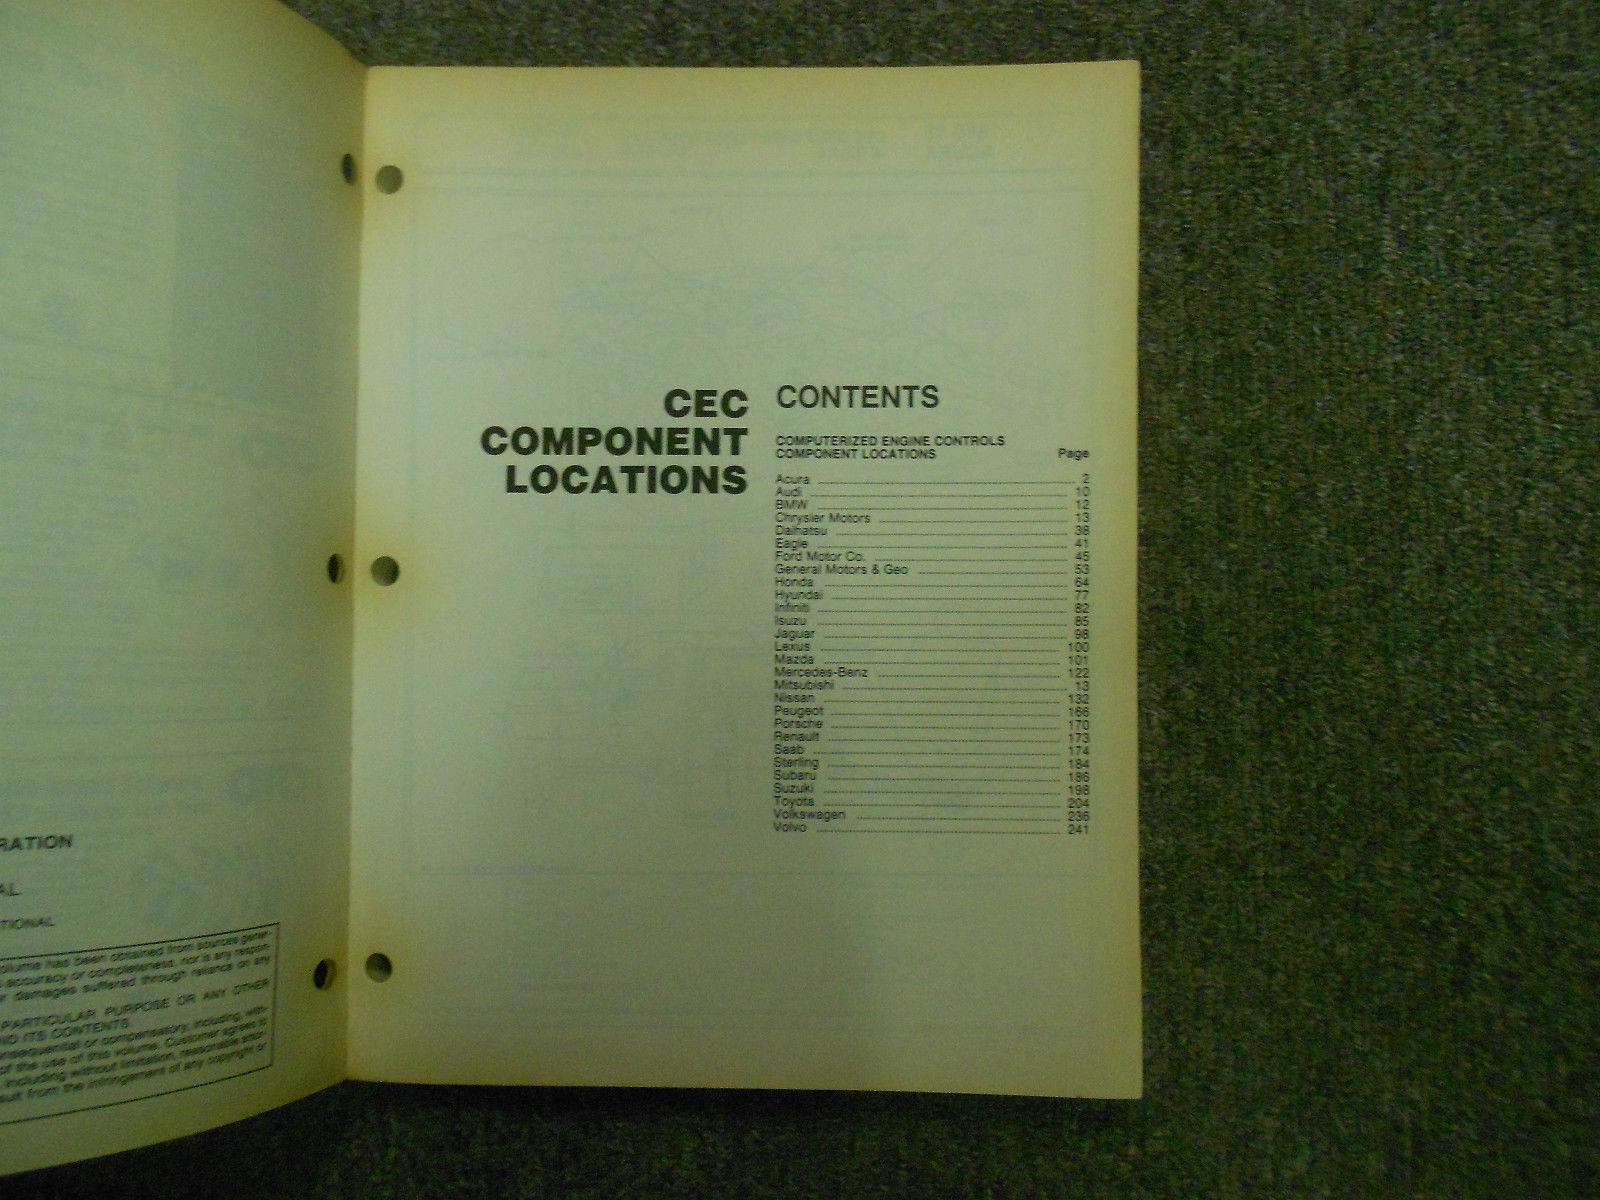 1991 MITSUBISHI Truck Service Repair Shop Manual FACTORY OEM 5 VOL SET BOOK 91